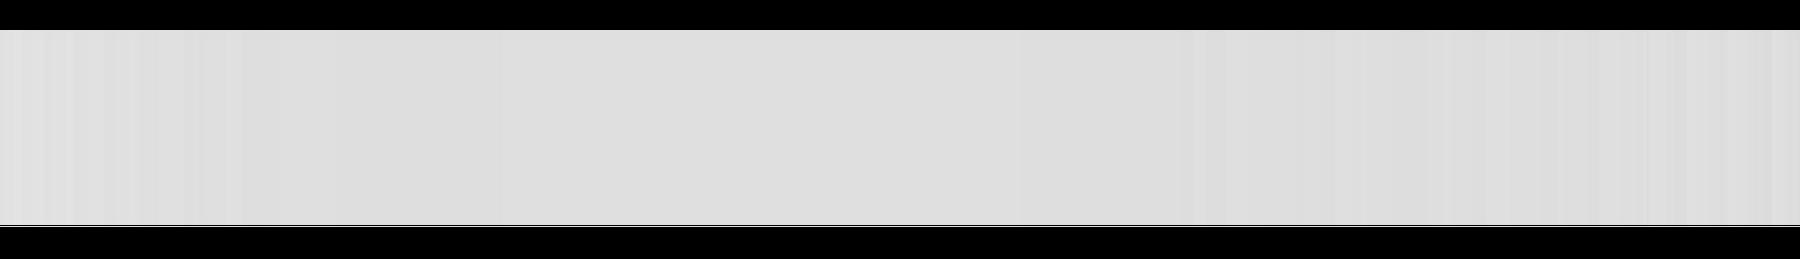 DarkGreen-Fade_edited_edited_edited_edit